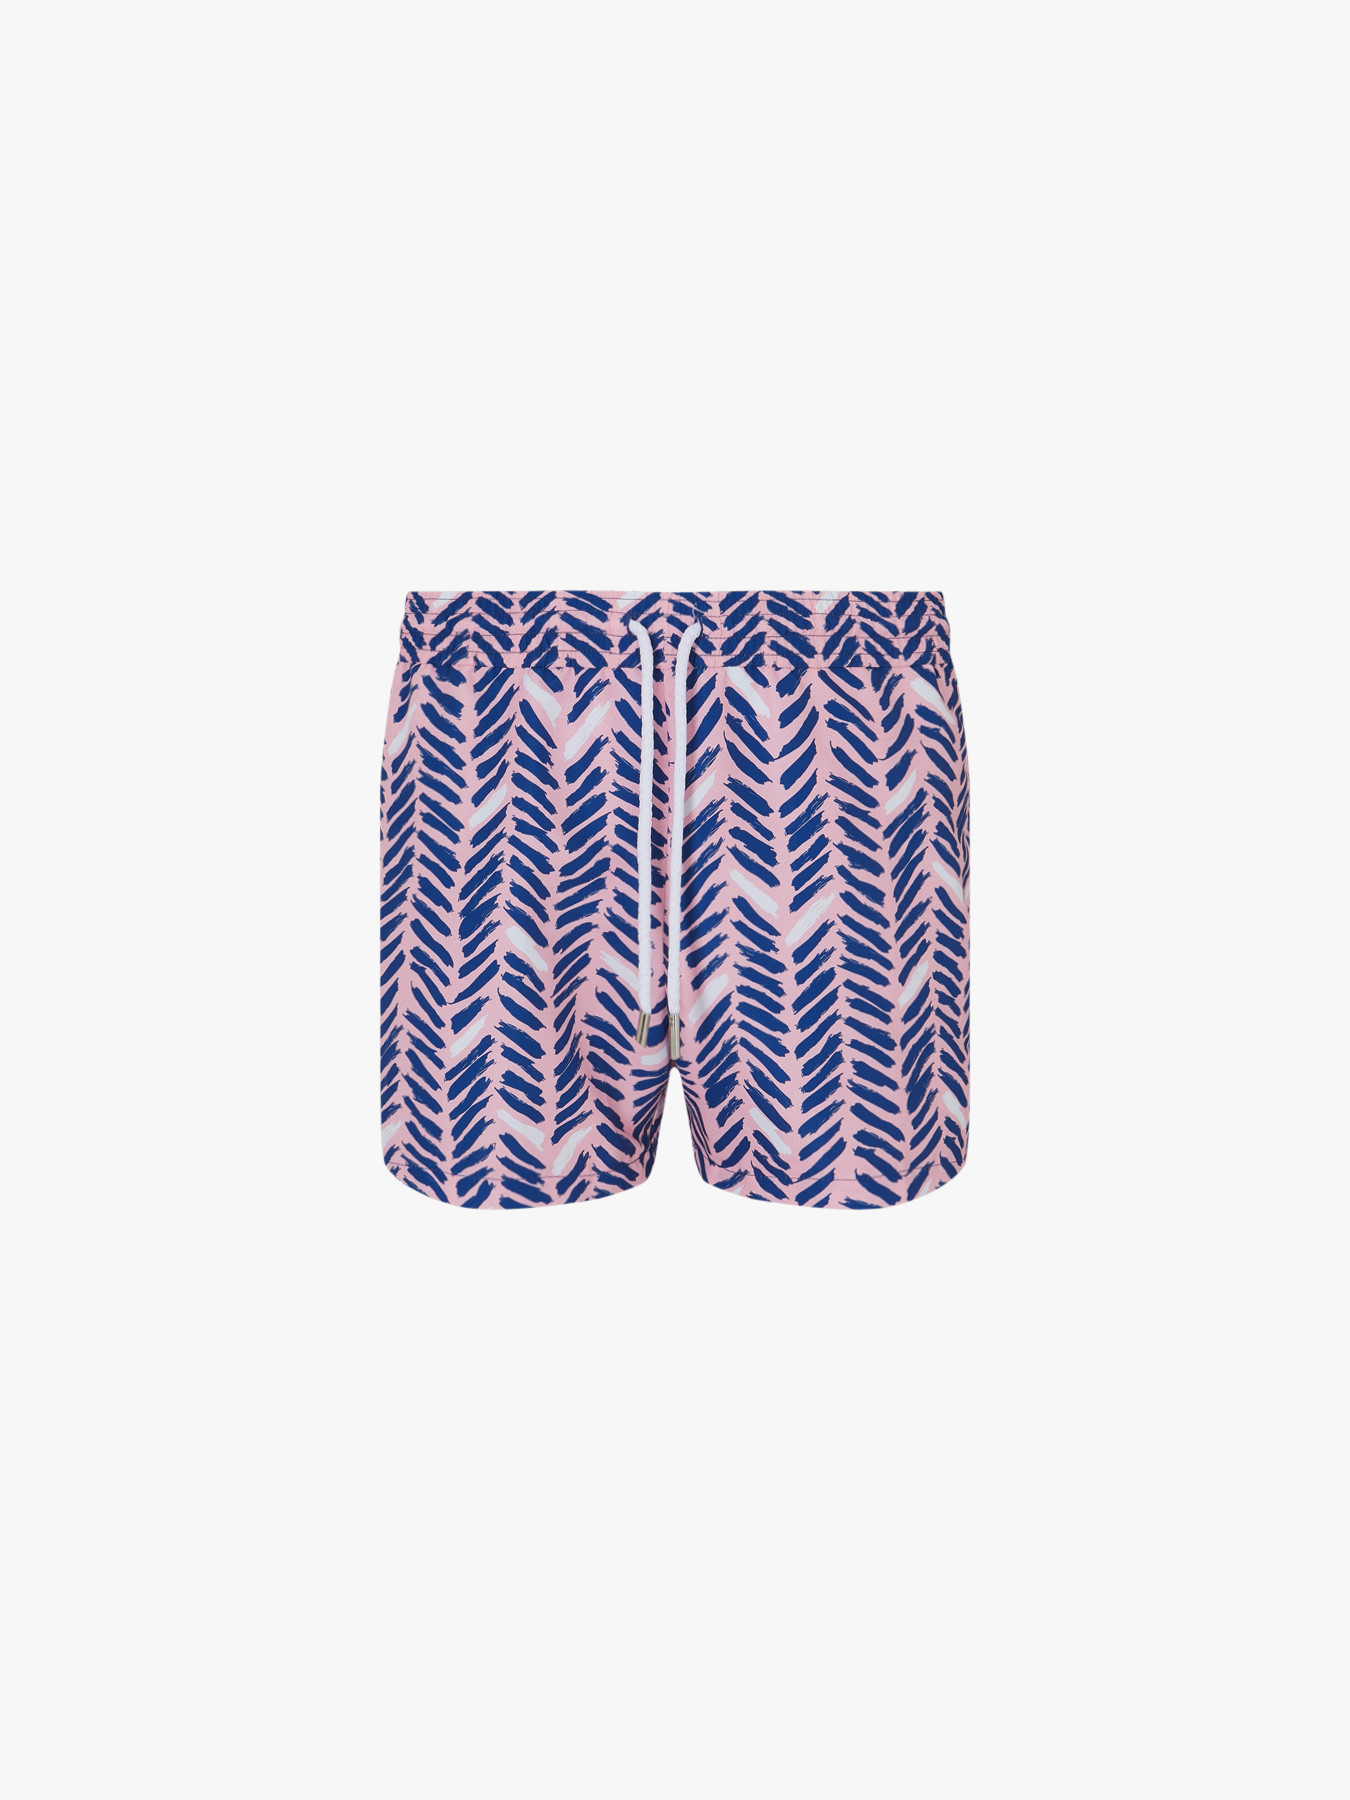 a4e99d9d8ee Frescobol Carioca Pira Sport Swim Shorts | Trunks | Fenwick